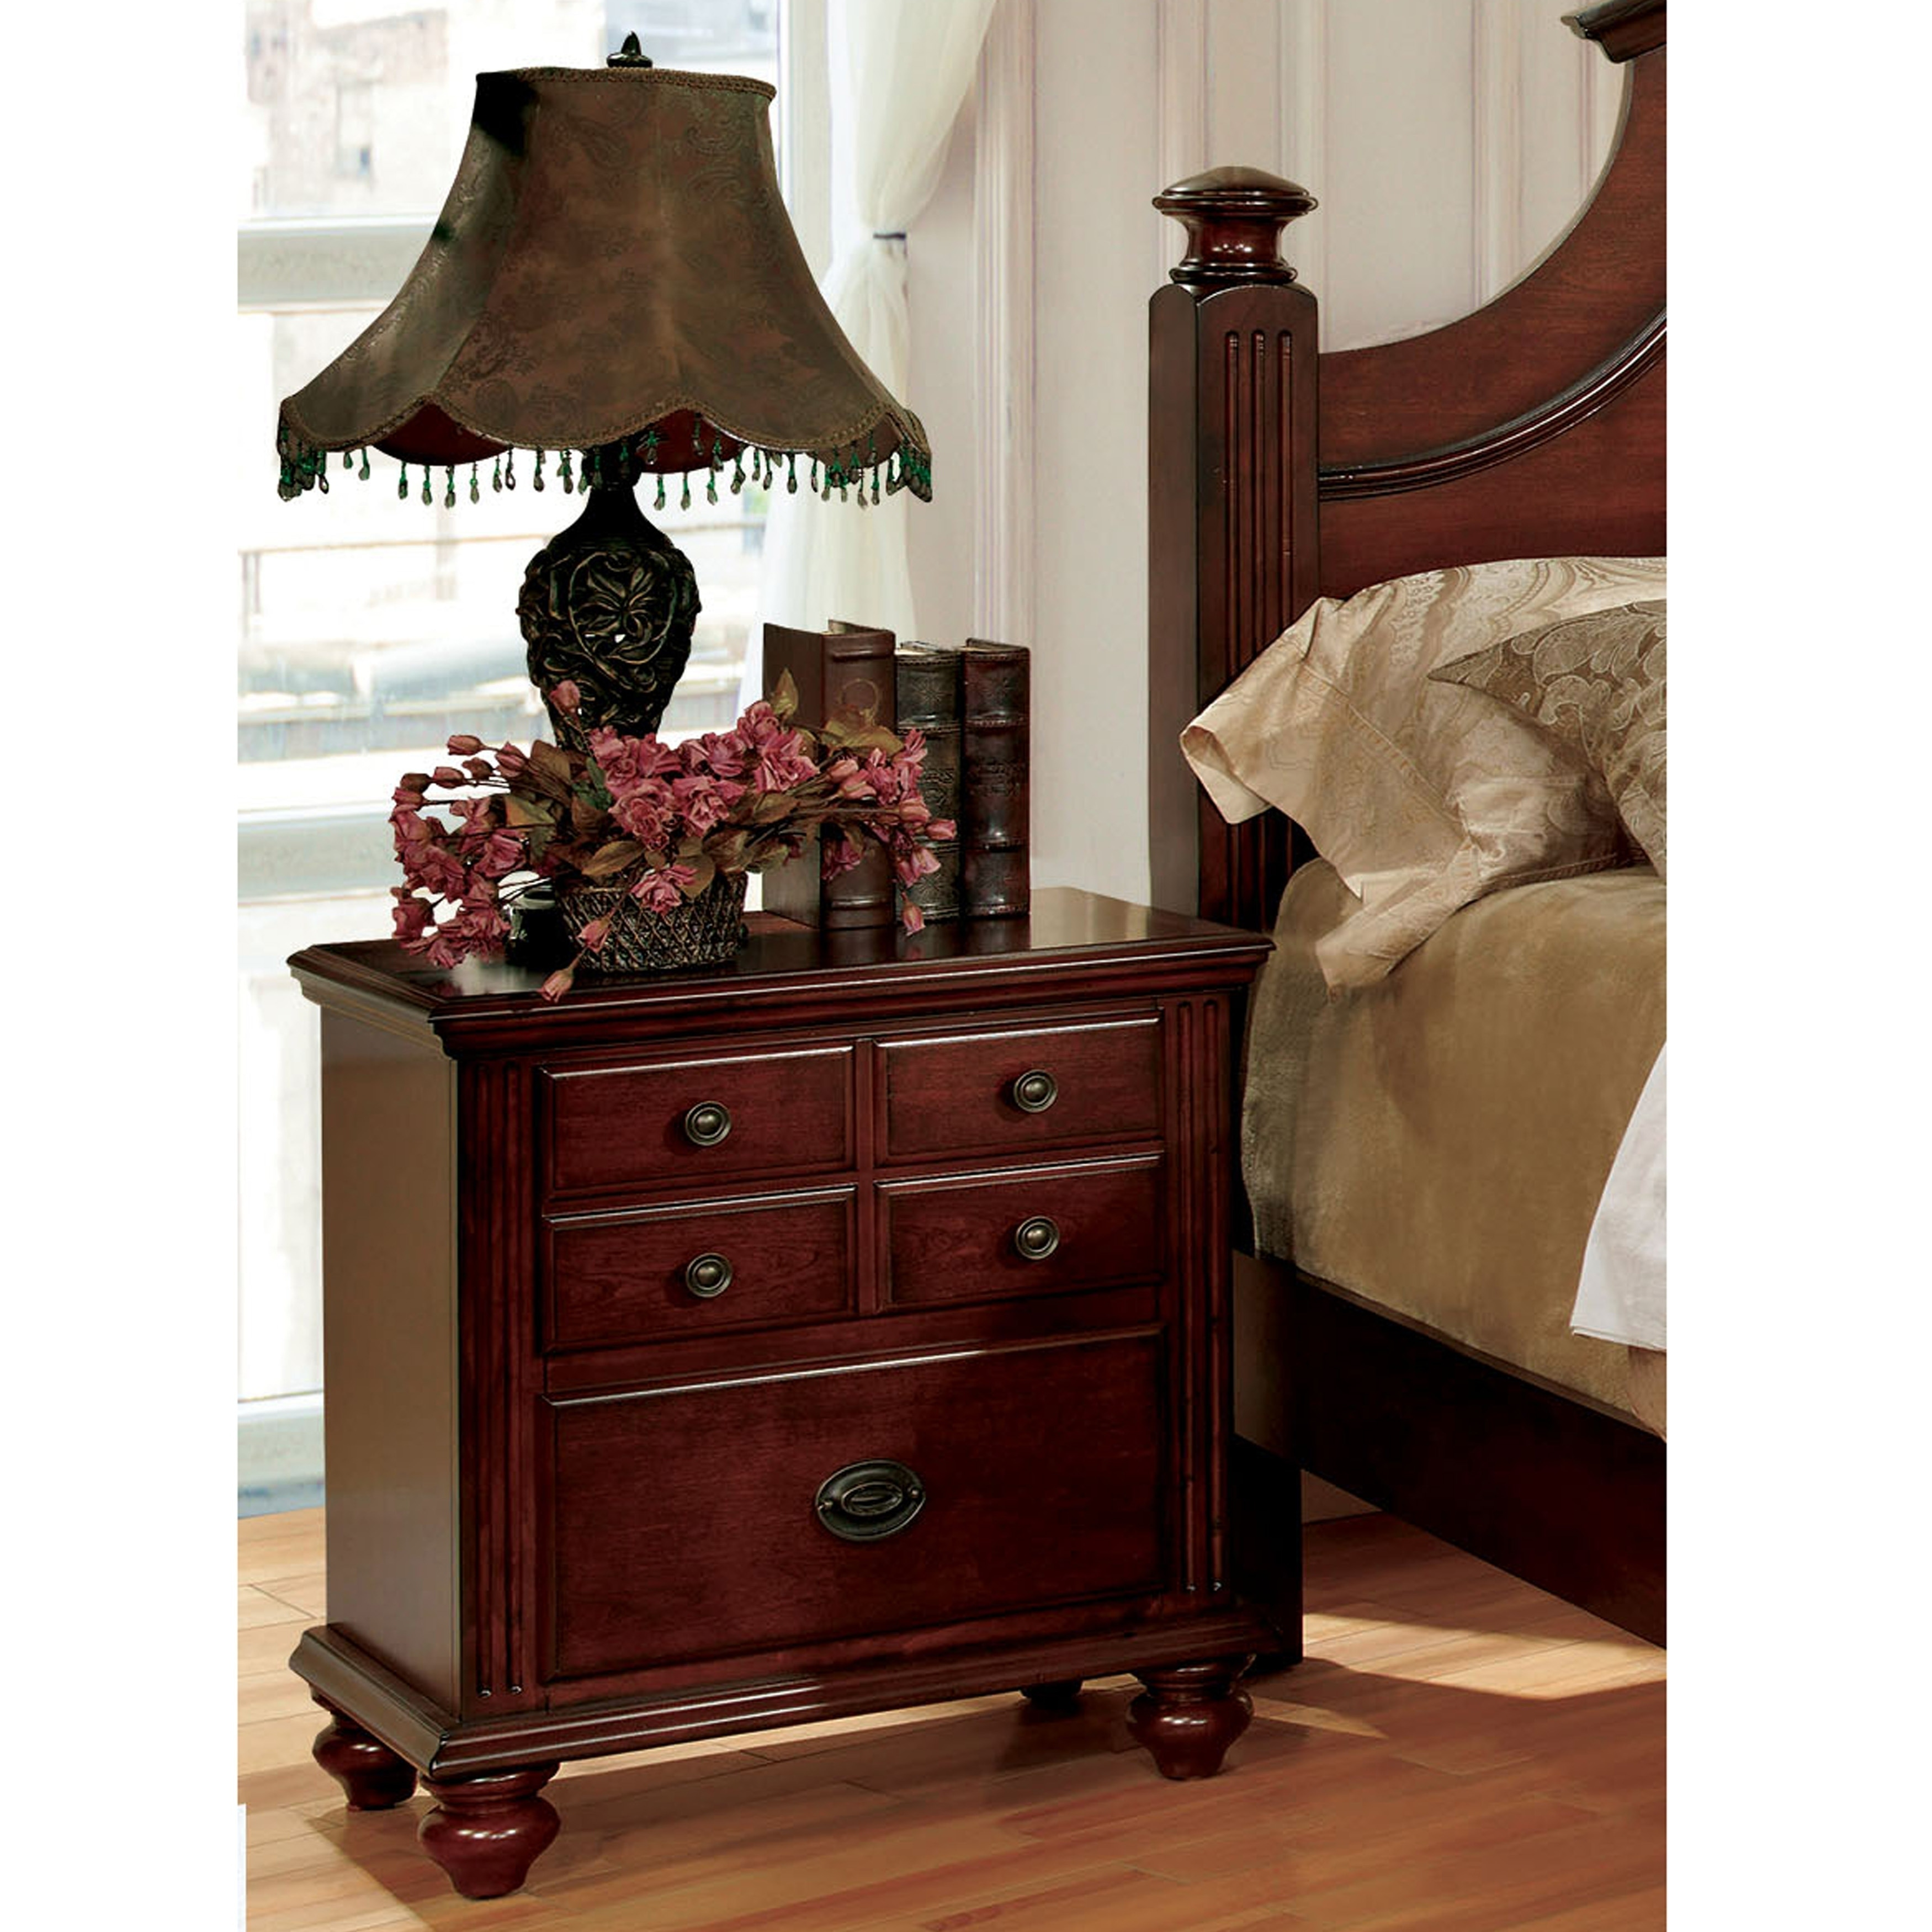 Furniture Of America Sibu European Cherry Solid Wood Nightstand